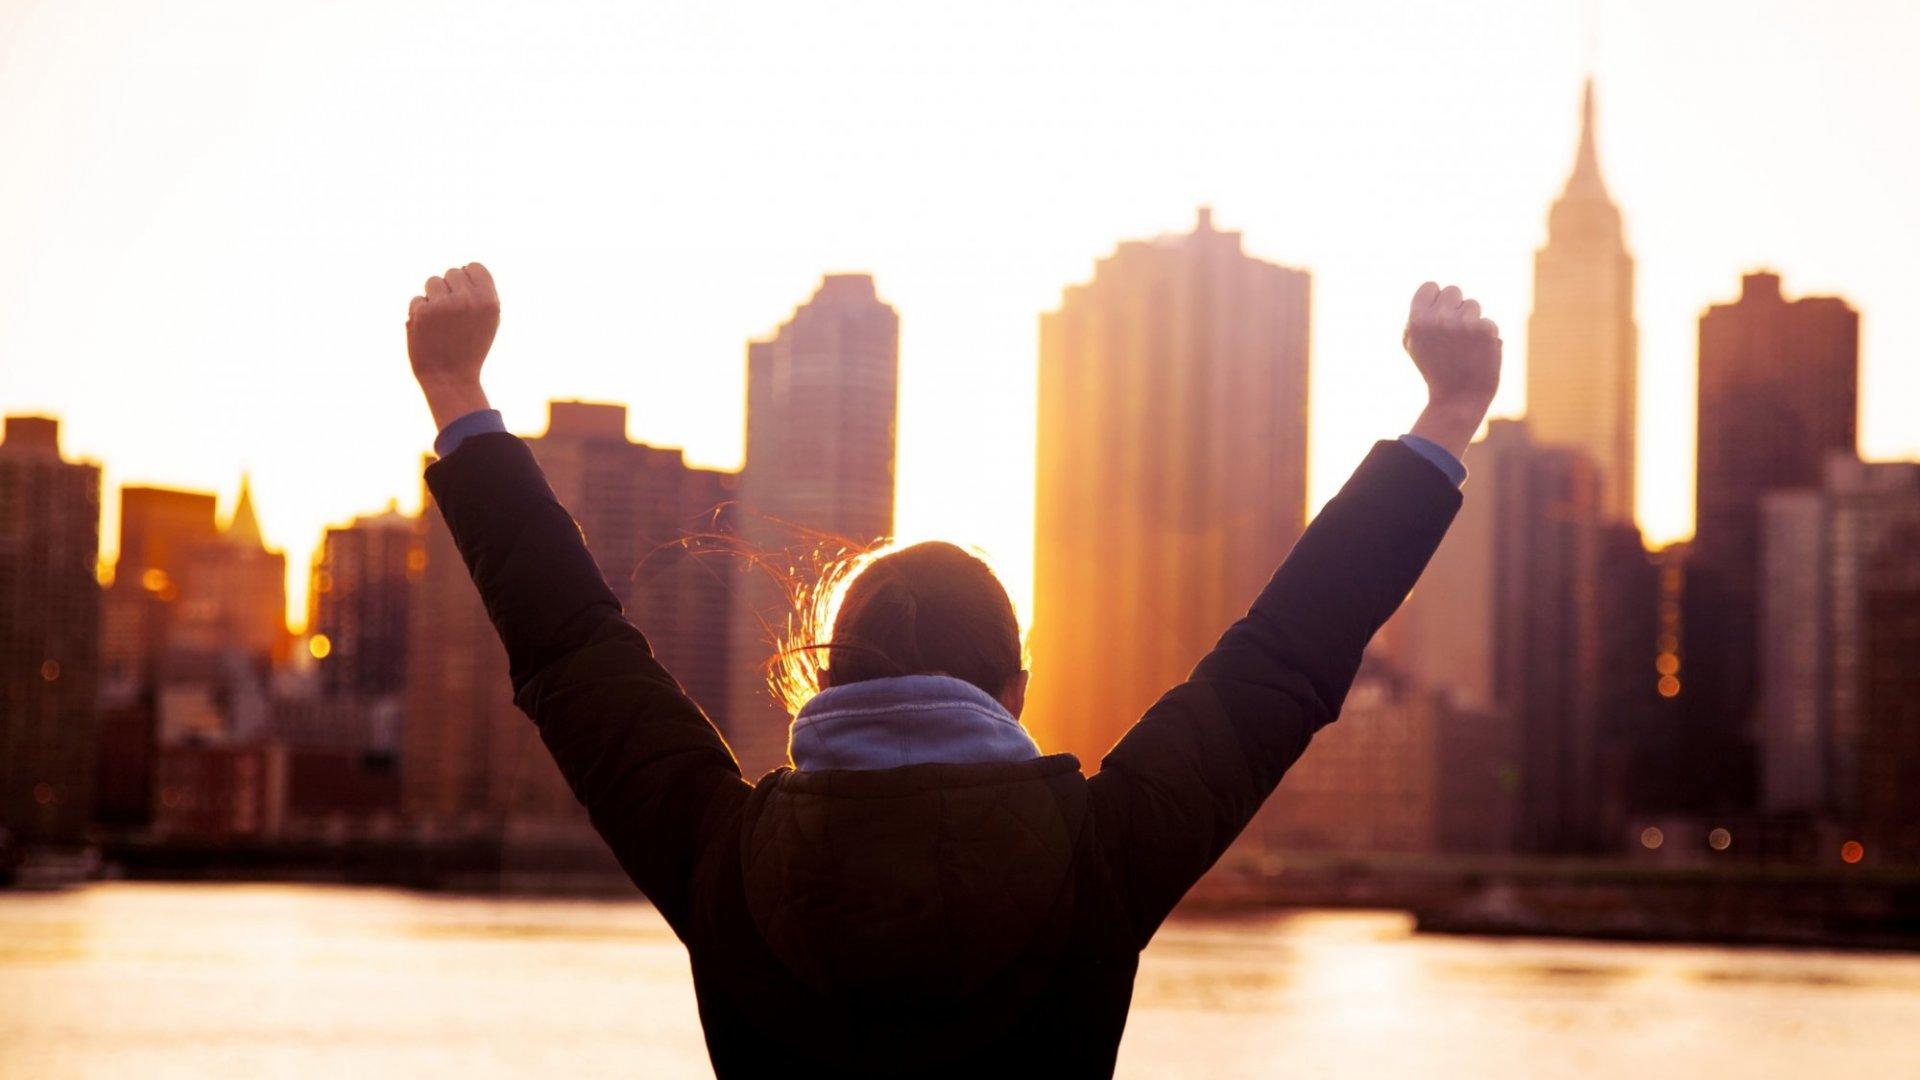 Set SMARTER goals to ensure long-term success